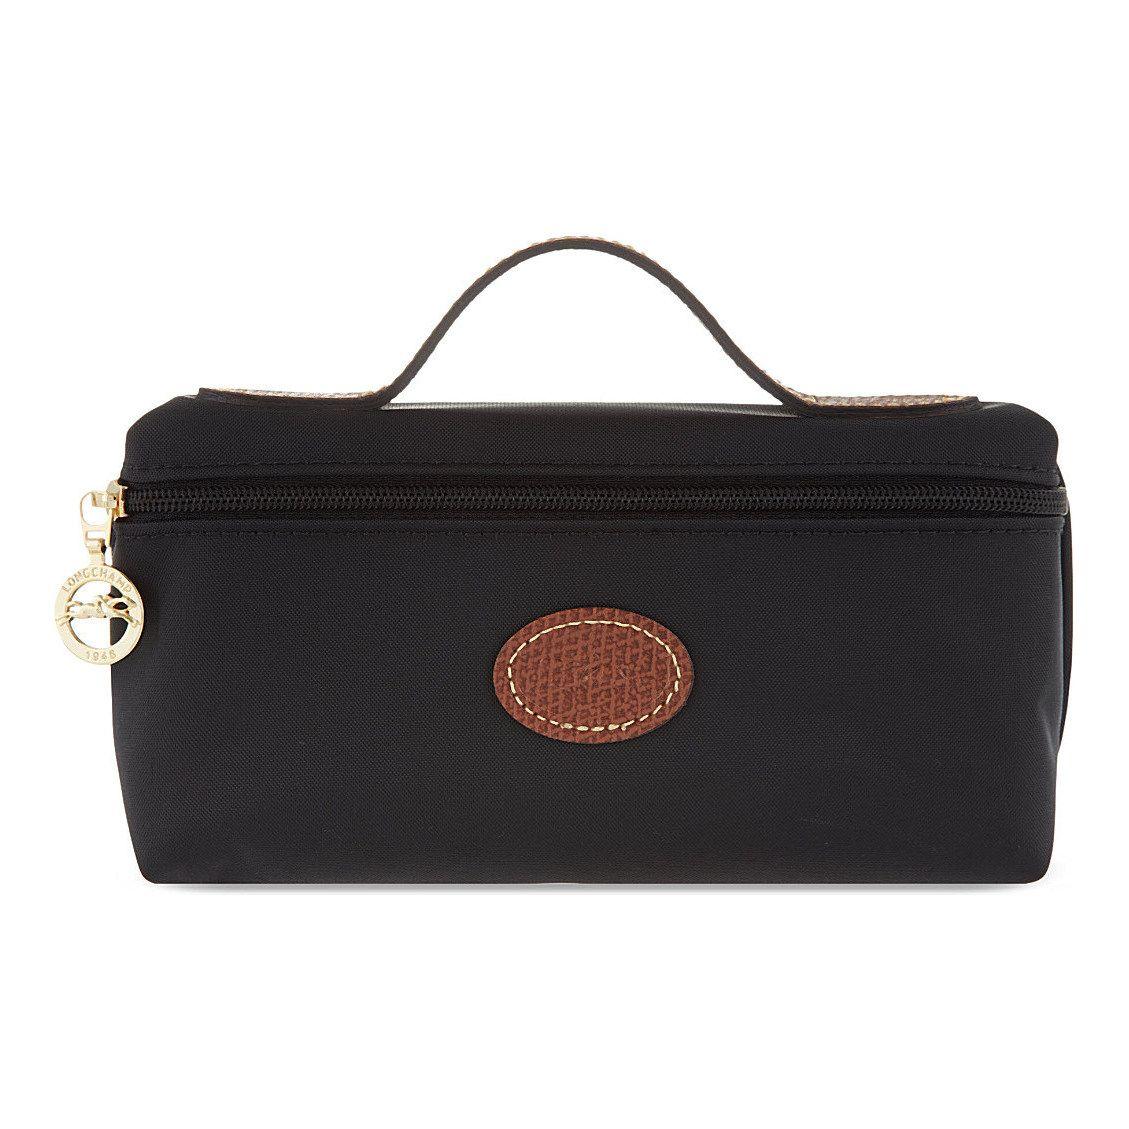 Longchamp Le Pliage Cosmetic Toiletry Bag